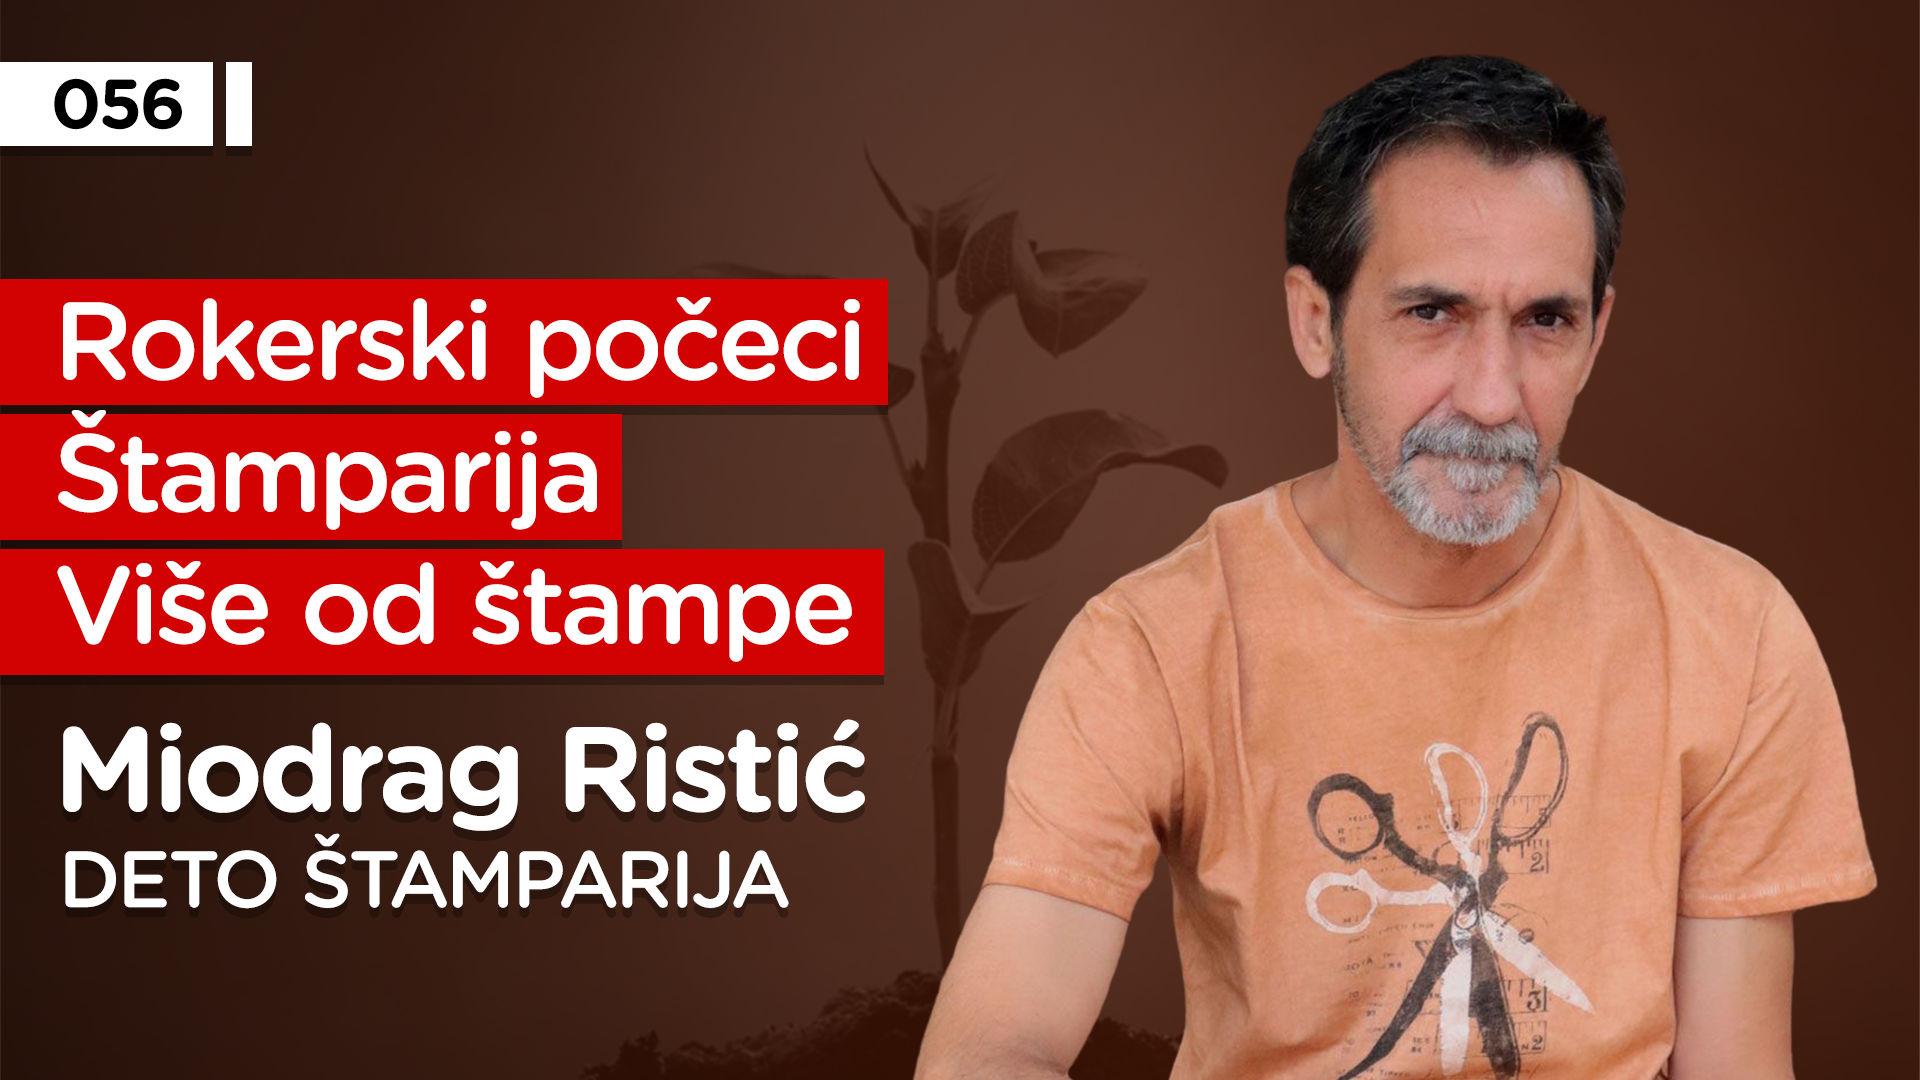 EP056: Miodrag Ristić